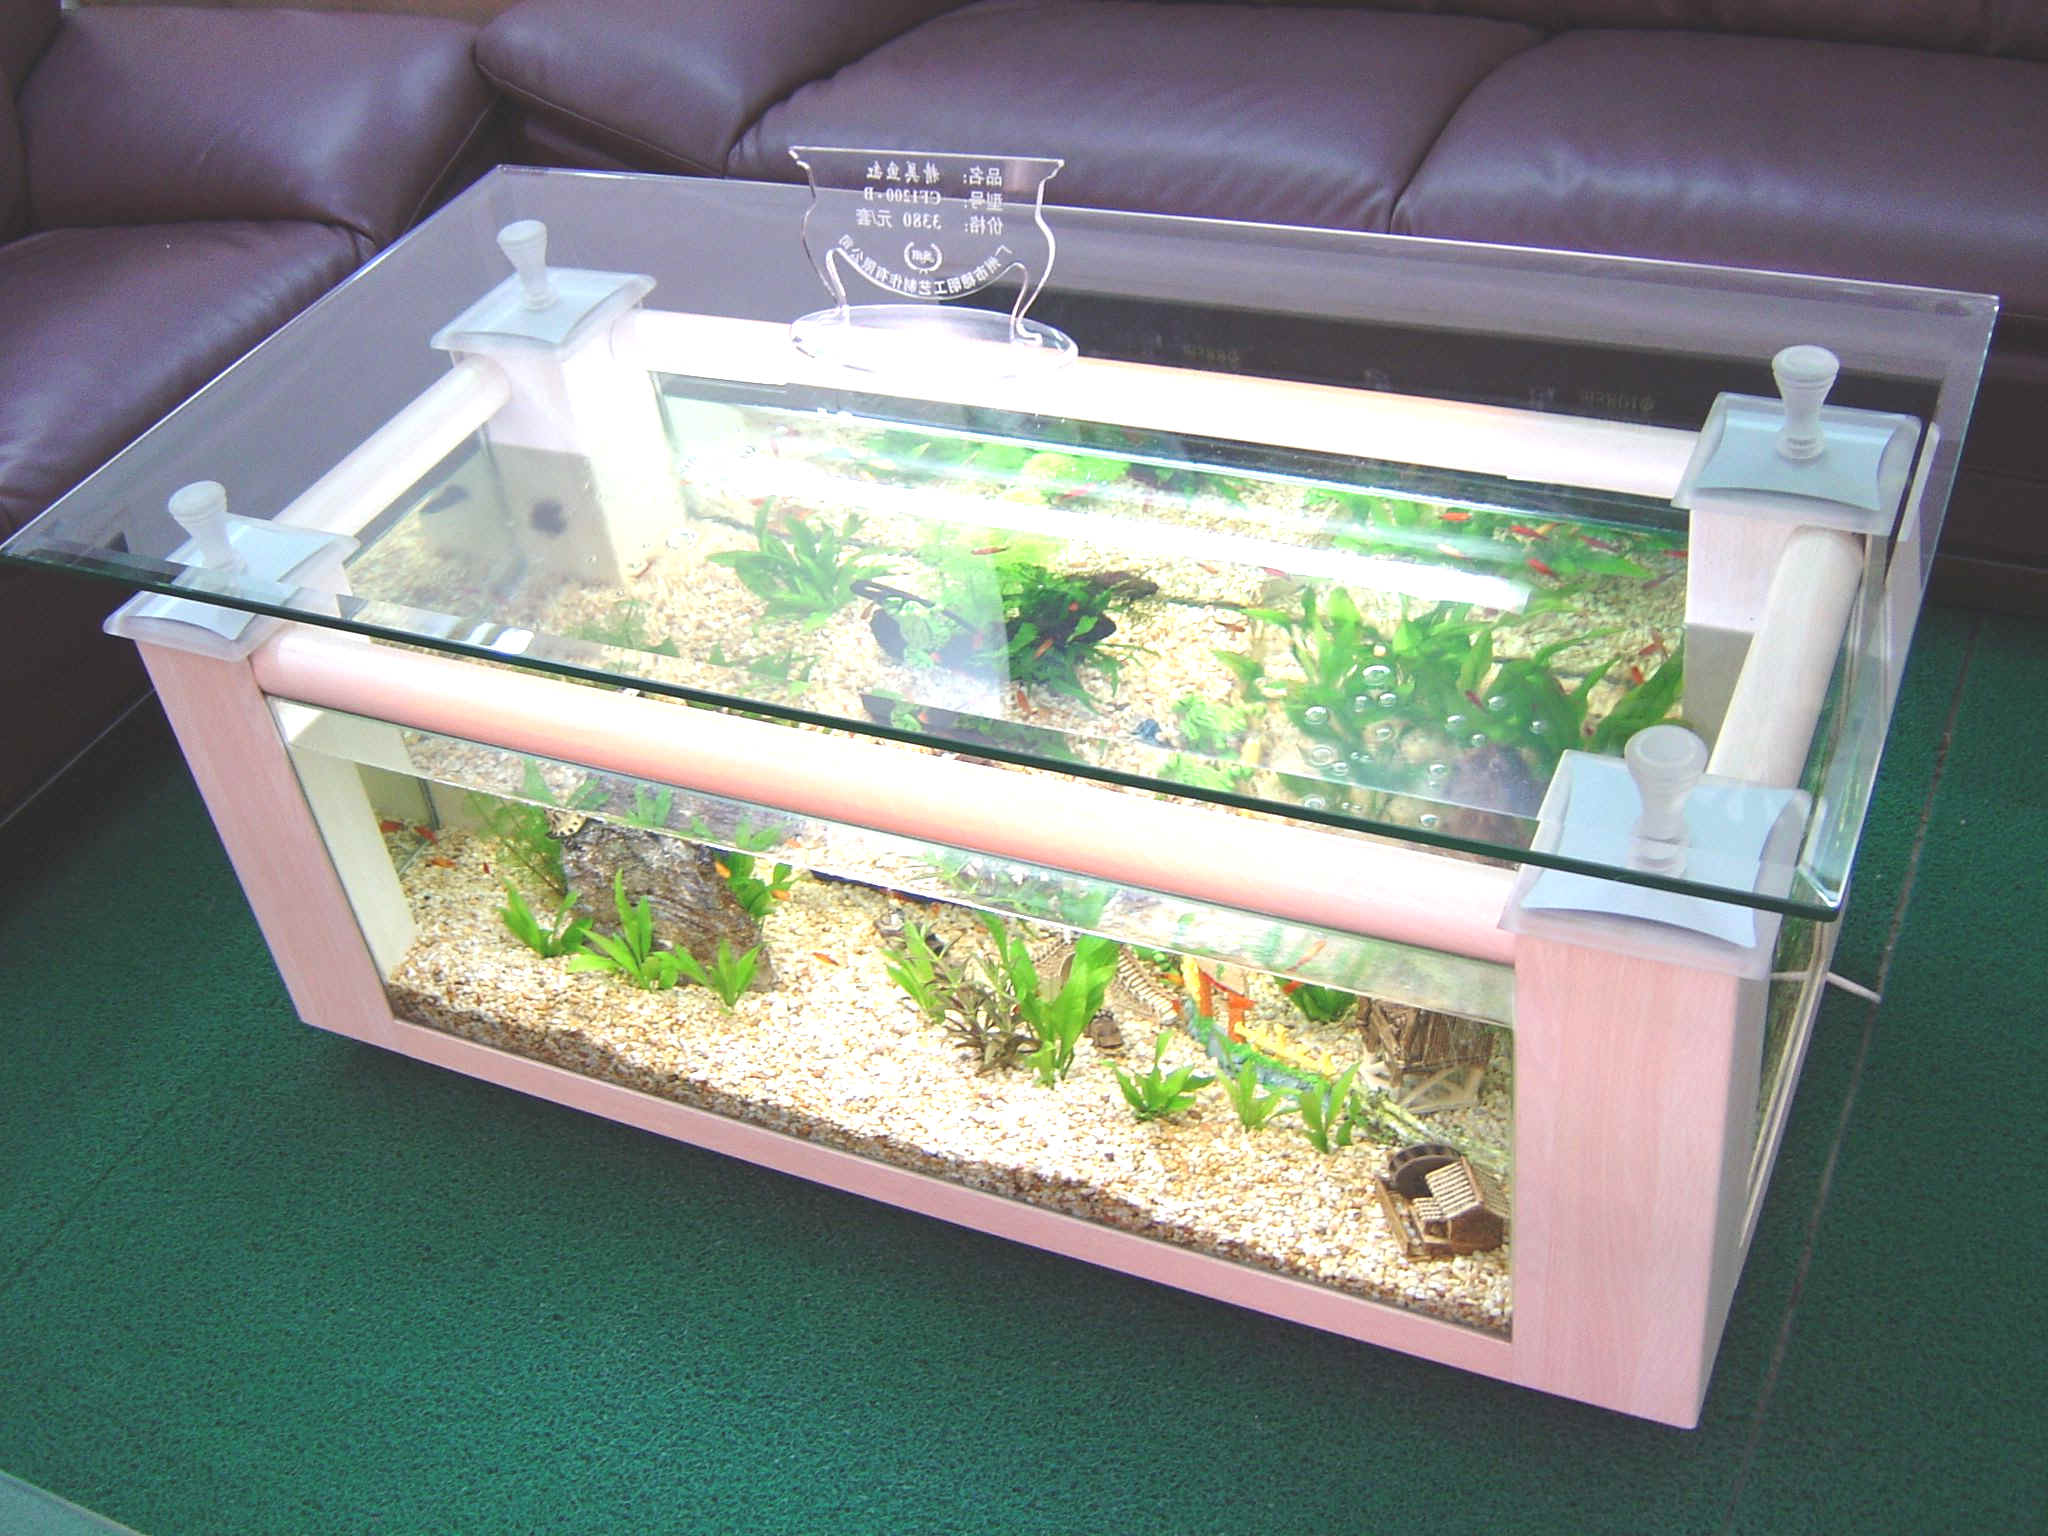 Coffee table aquarium for sale roy home design - Coffee table aquarium for sale ...